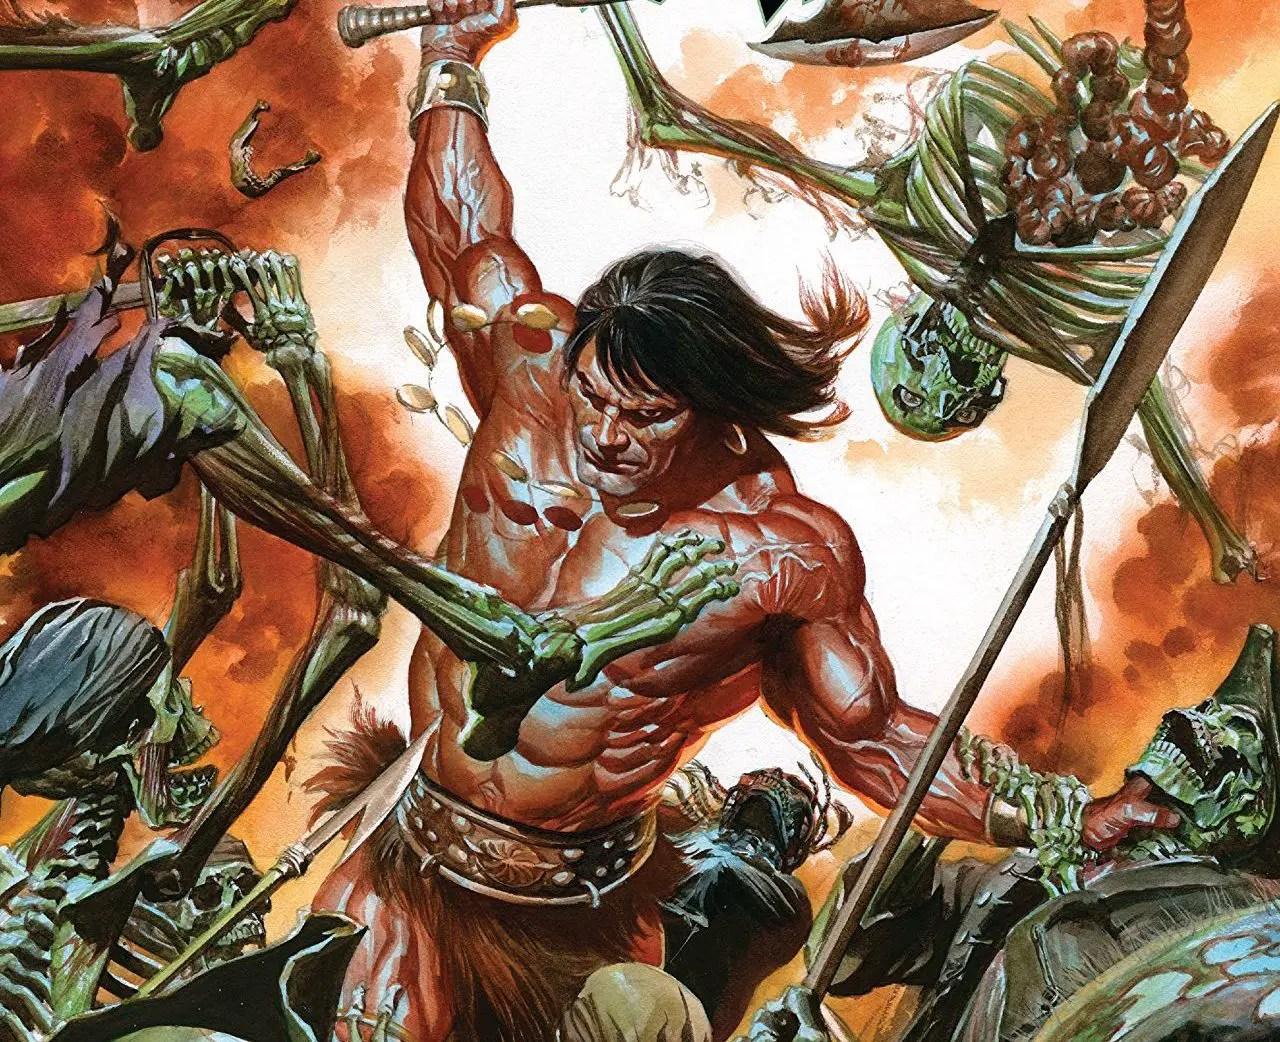 Savage Sword of Conan #1 Review